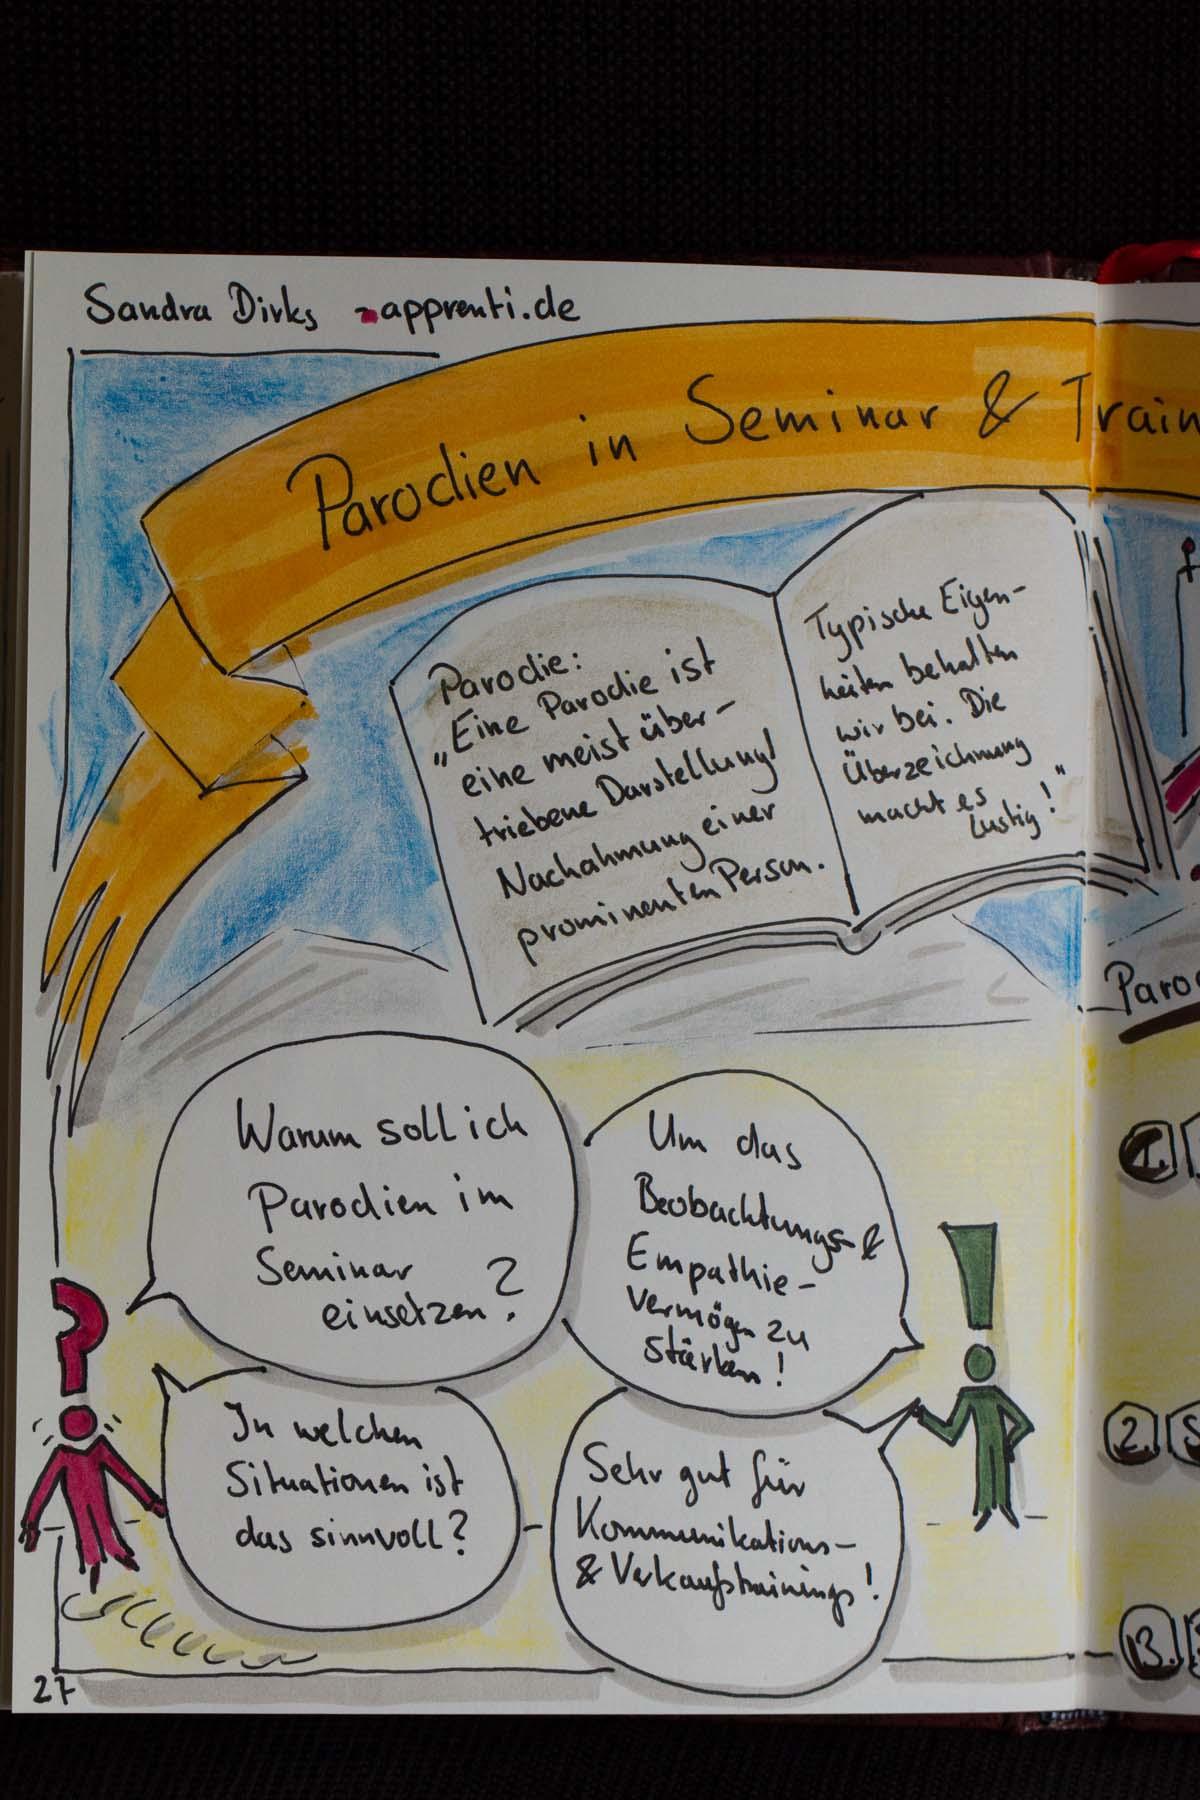 "Blog-Aktion ""Kommunikation ist wertvoll"" - Nr.14 Parodien in Seminar & Training"